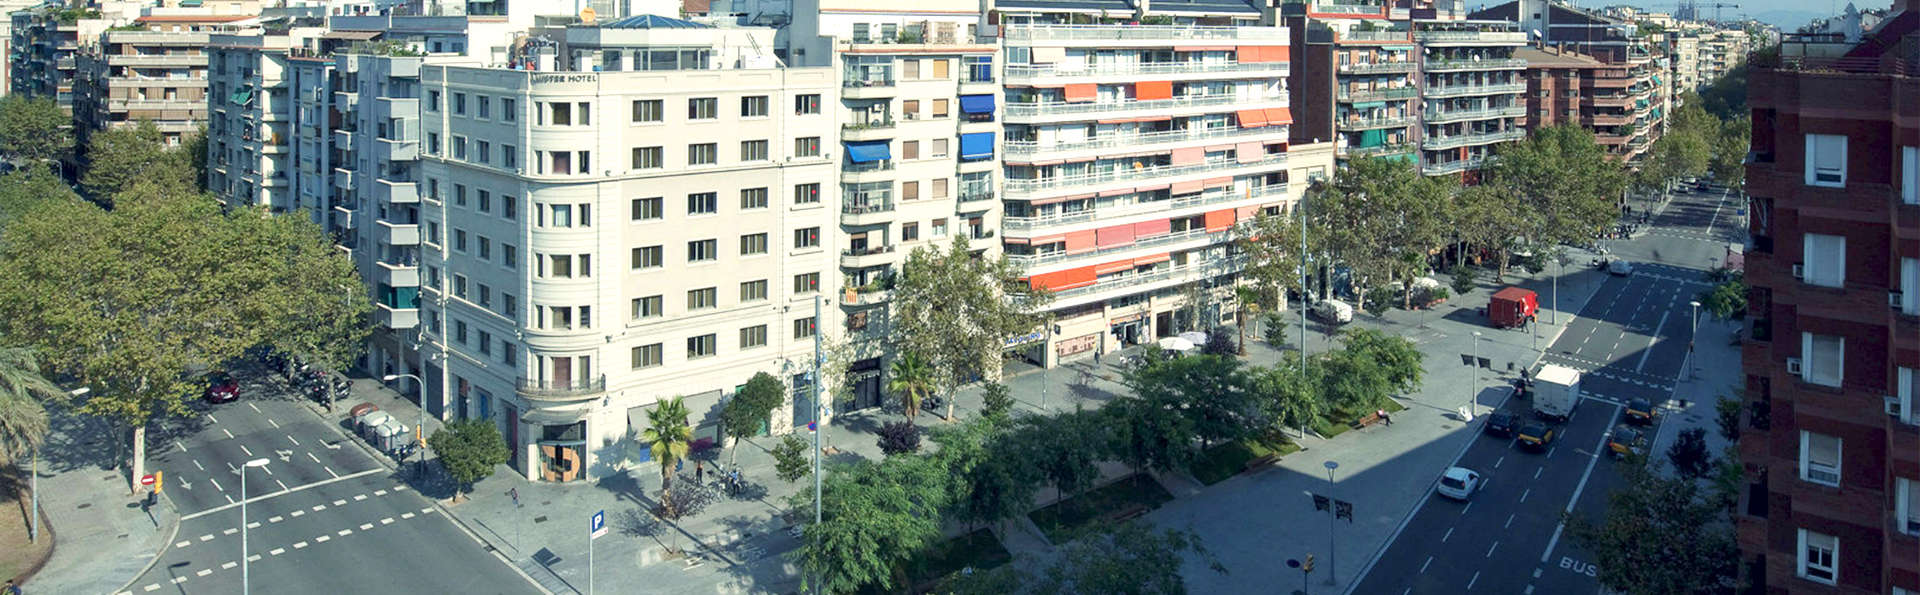 Sercotel Amister Art Hotel Barcelona - EDIT_2_FACHADA.jpg